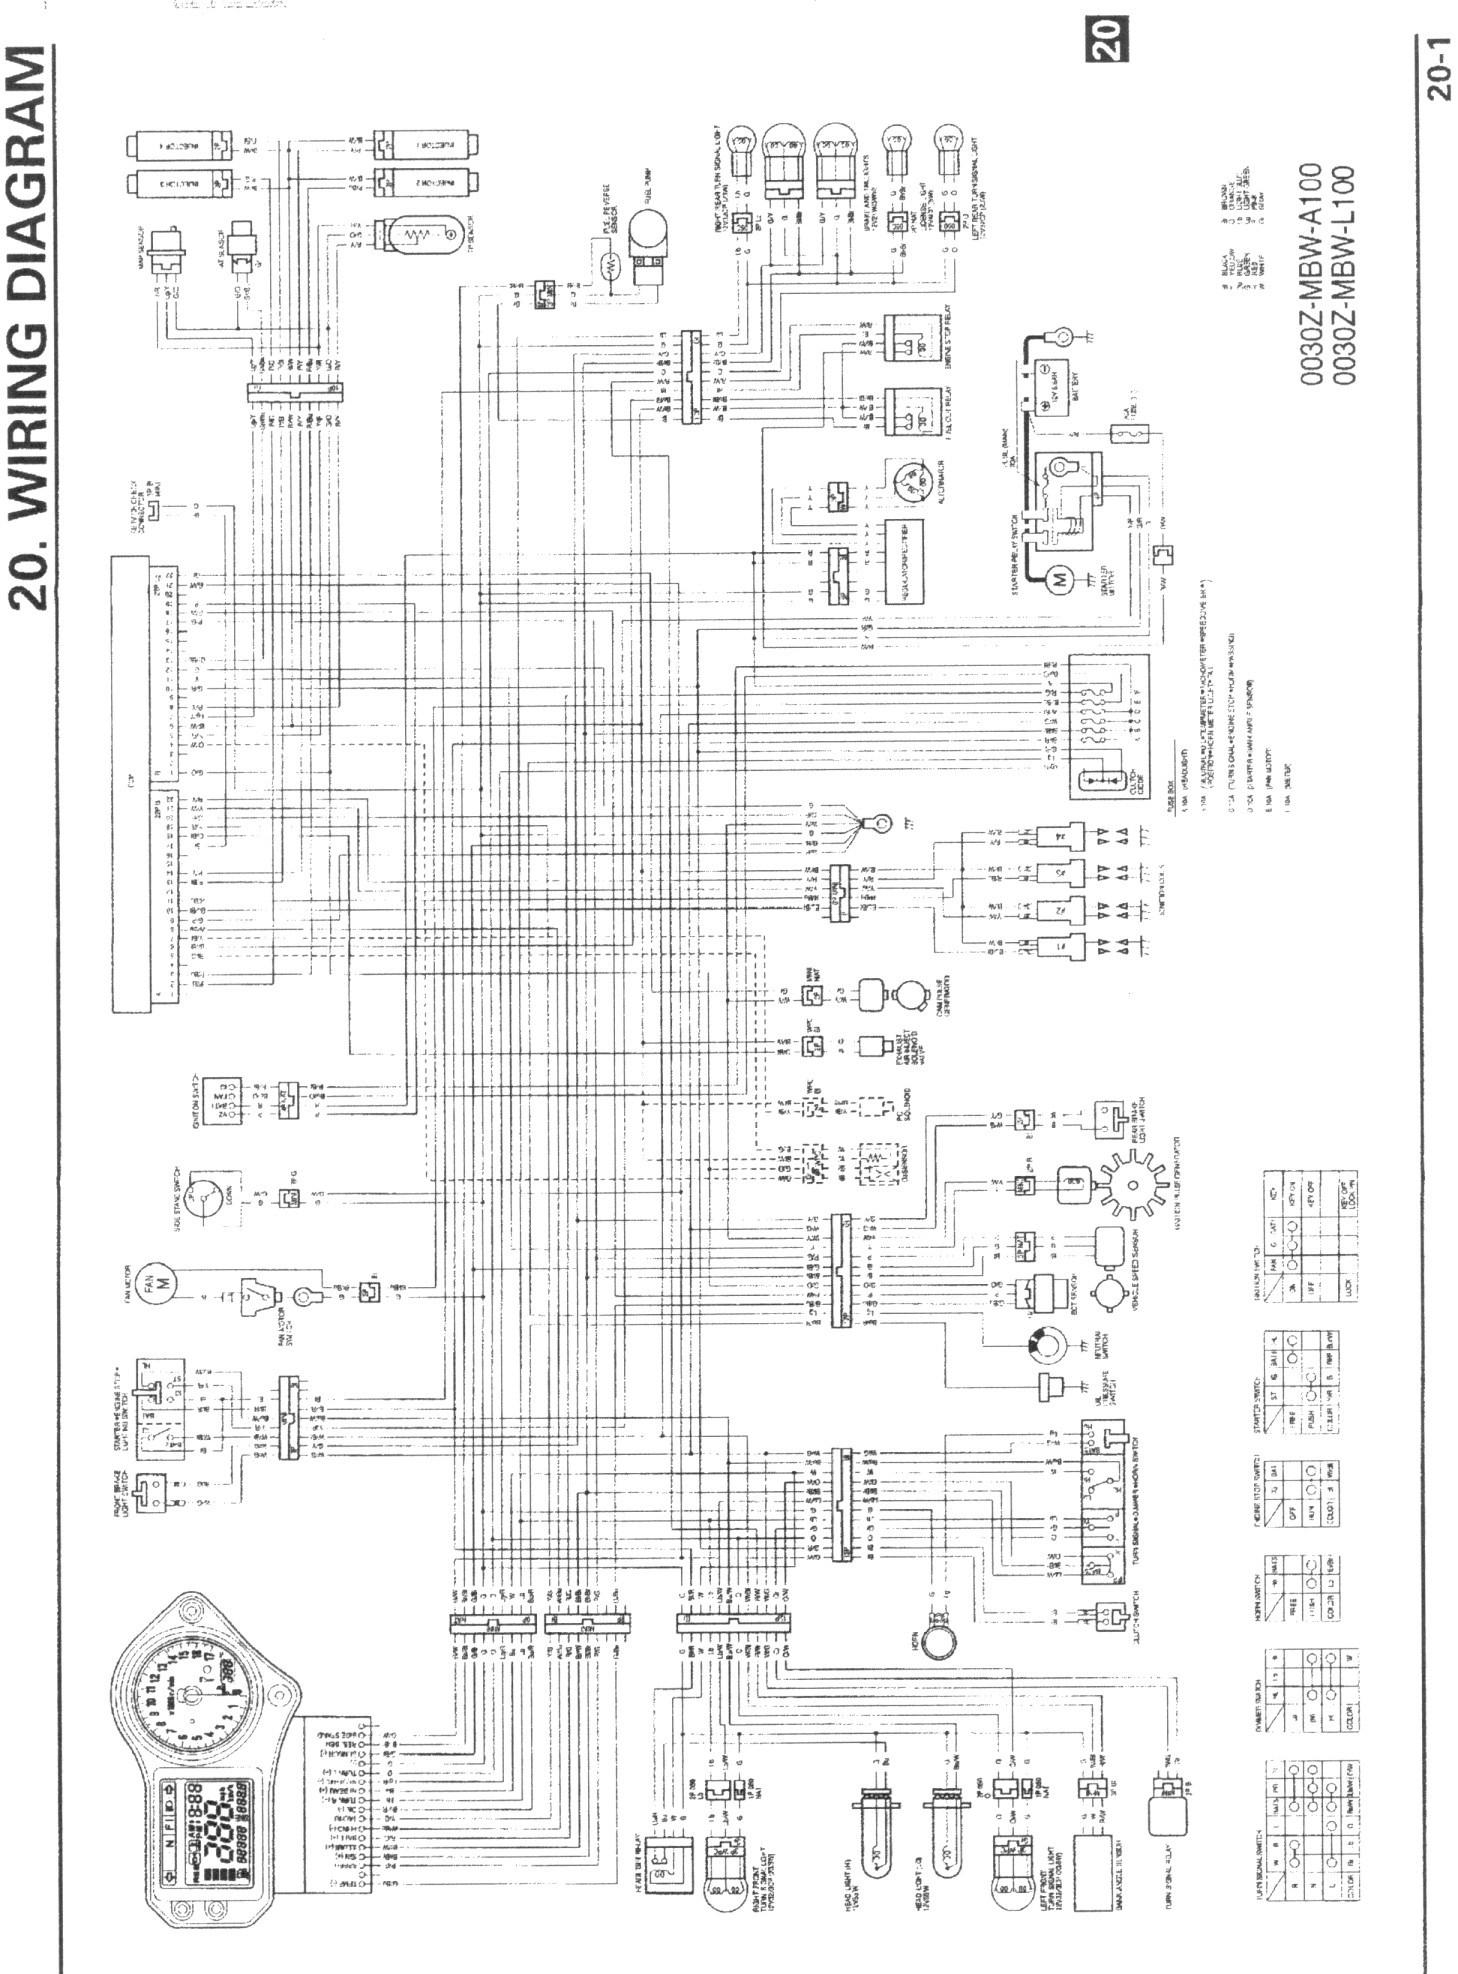 Cbr 600 F4i Headlight Wiring Diagram